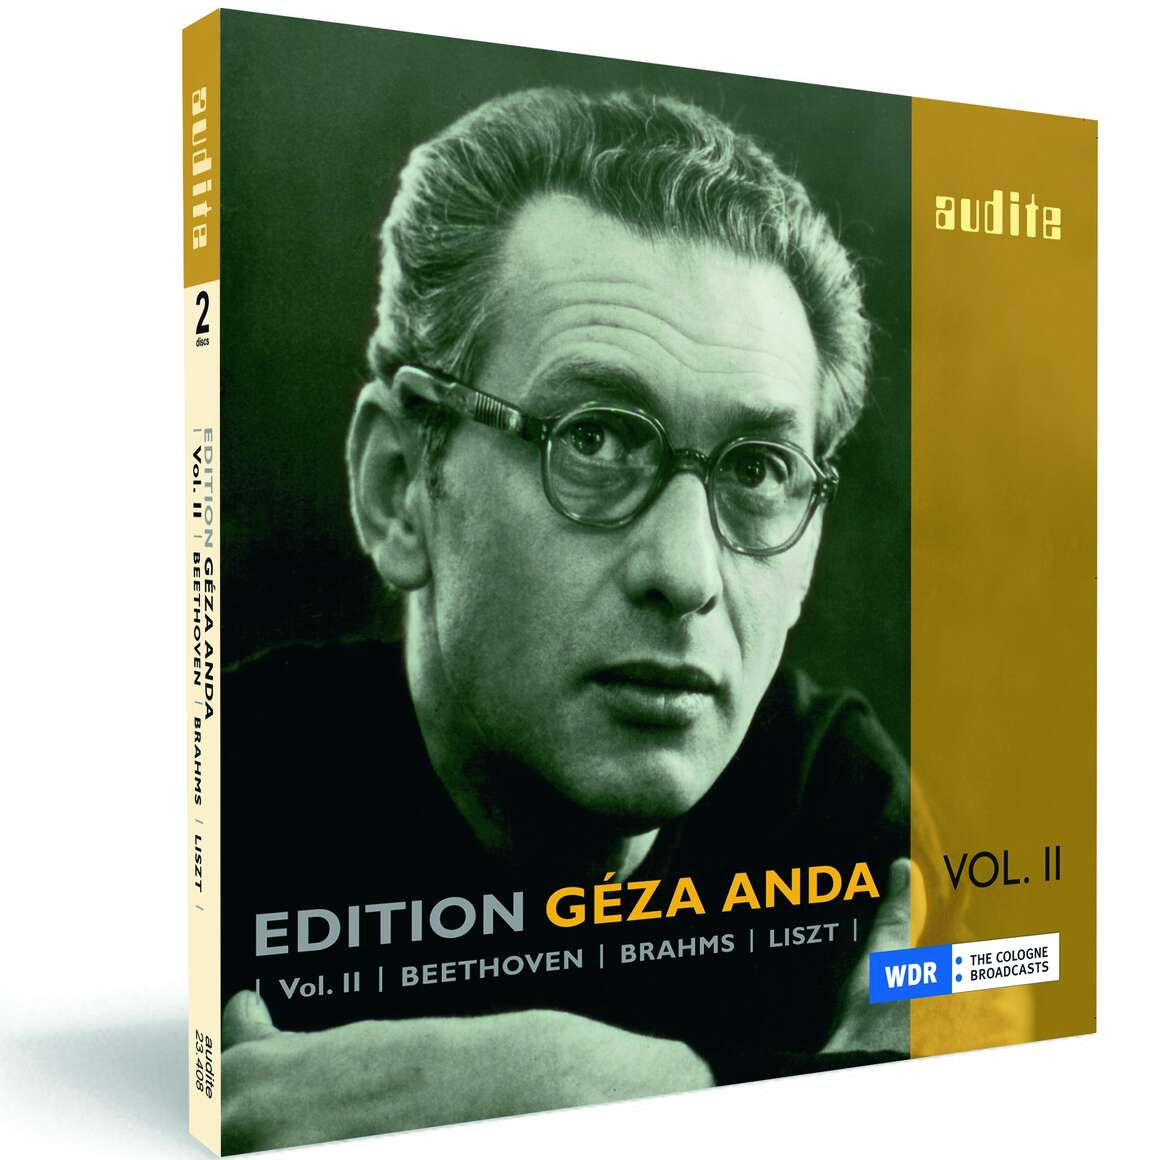 Edition Géza Anda (II) – Beethoven | Brahms | Liszt